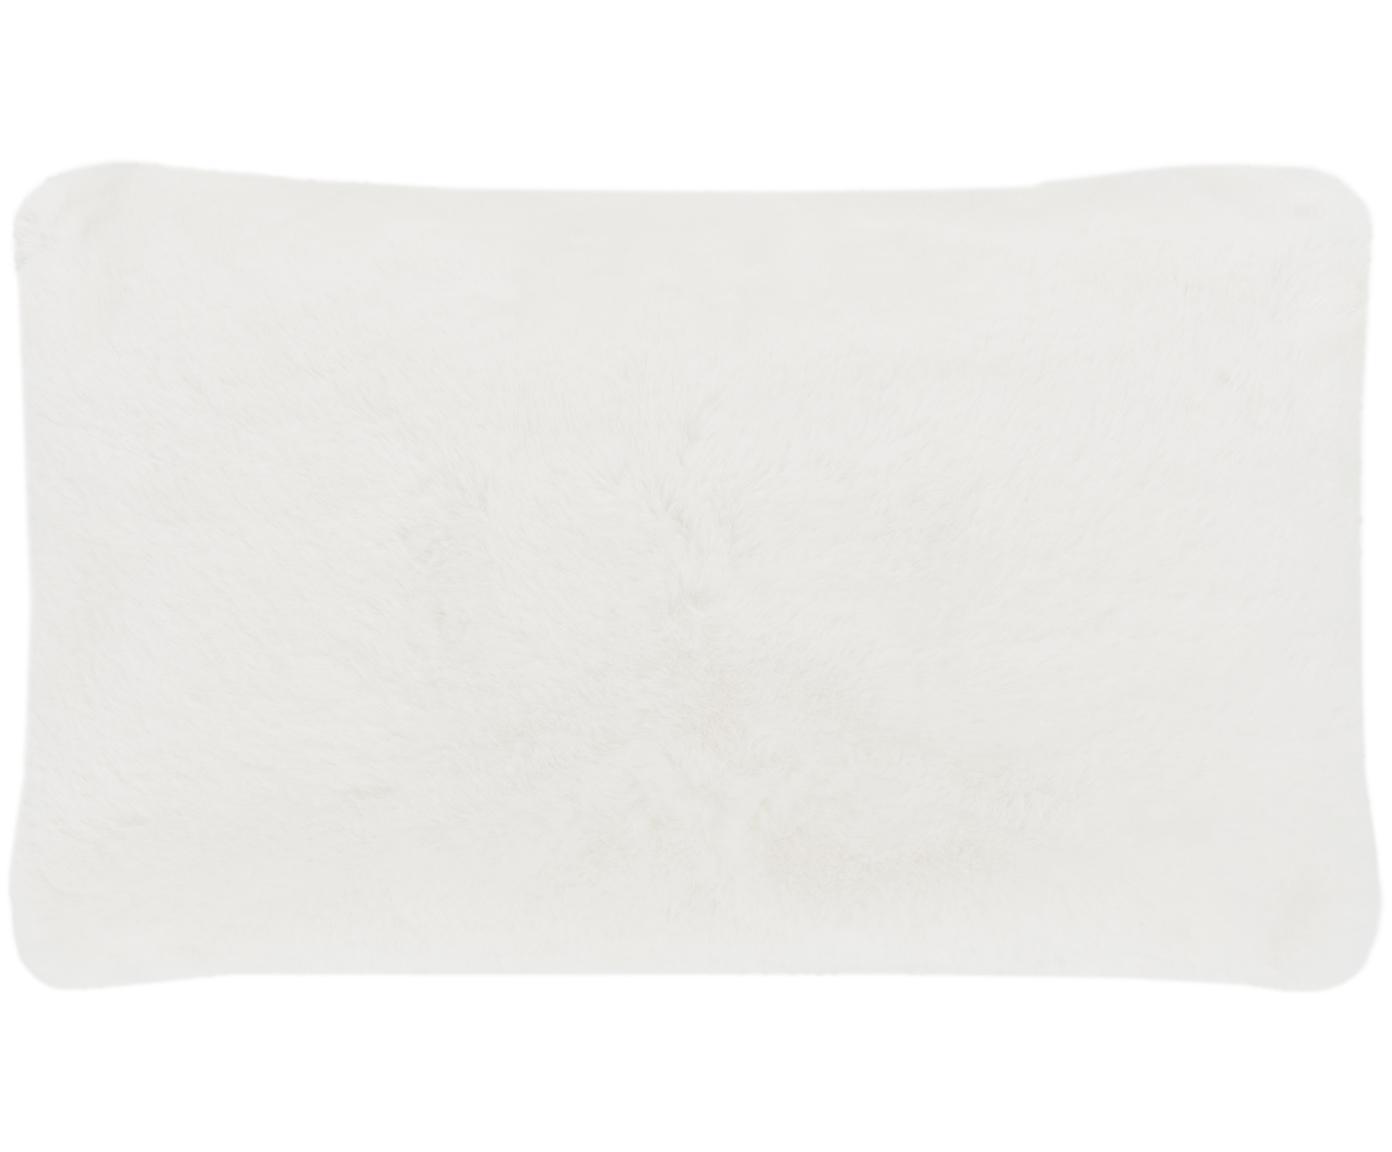 Federa arredo in similpelle Mette, Retro: 100% poliestere, Crema, Larg. 30 x Lung. 50 cm